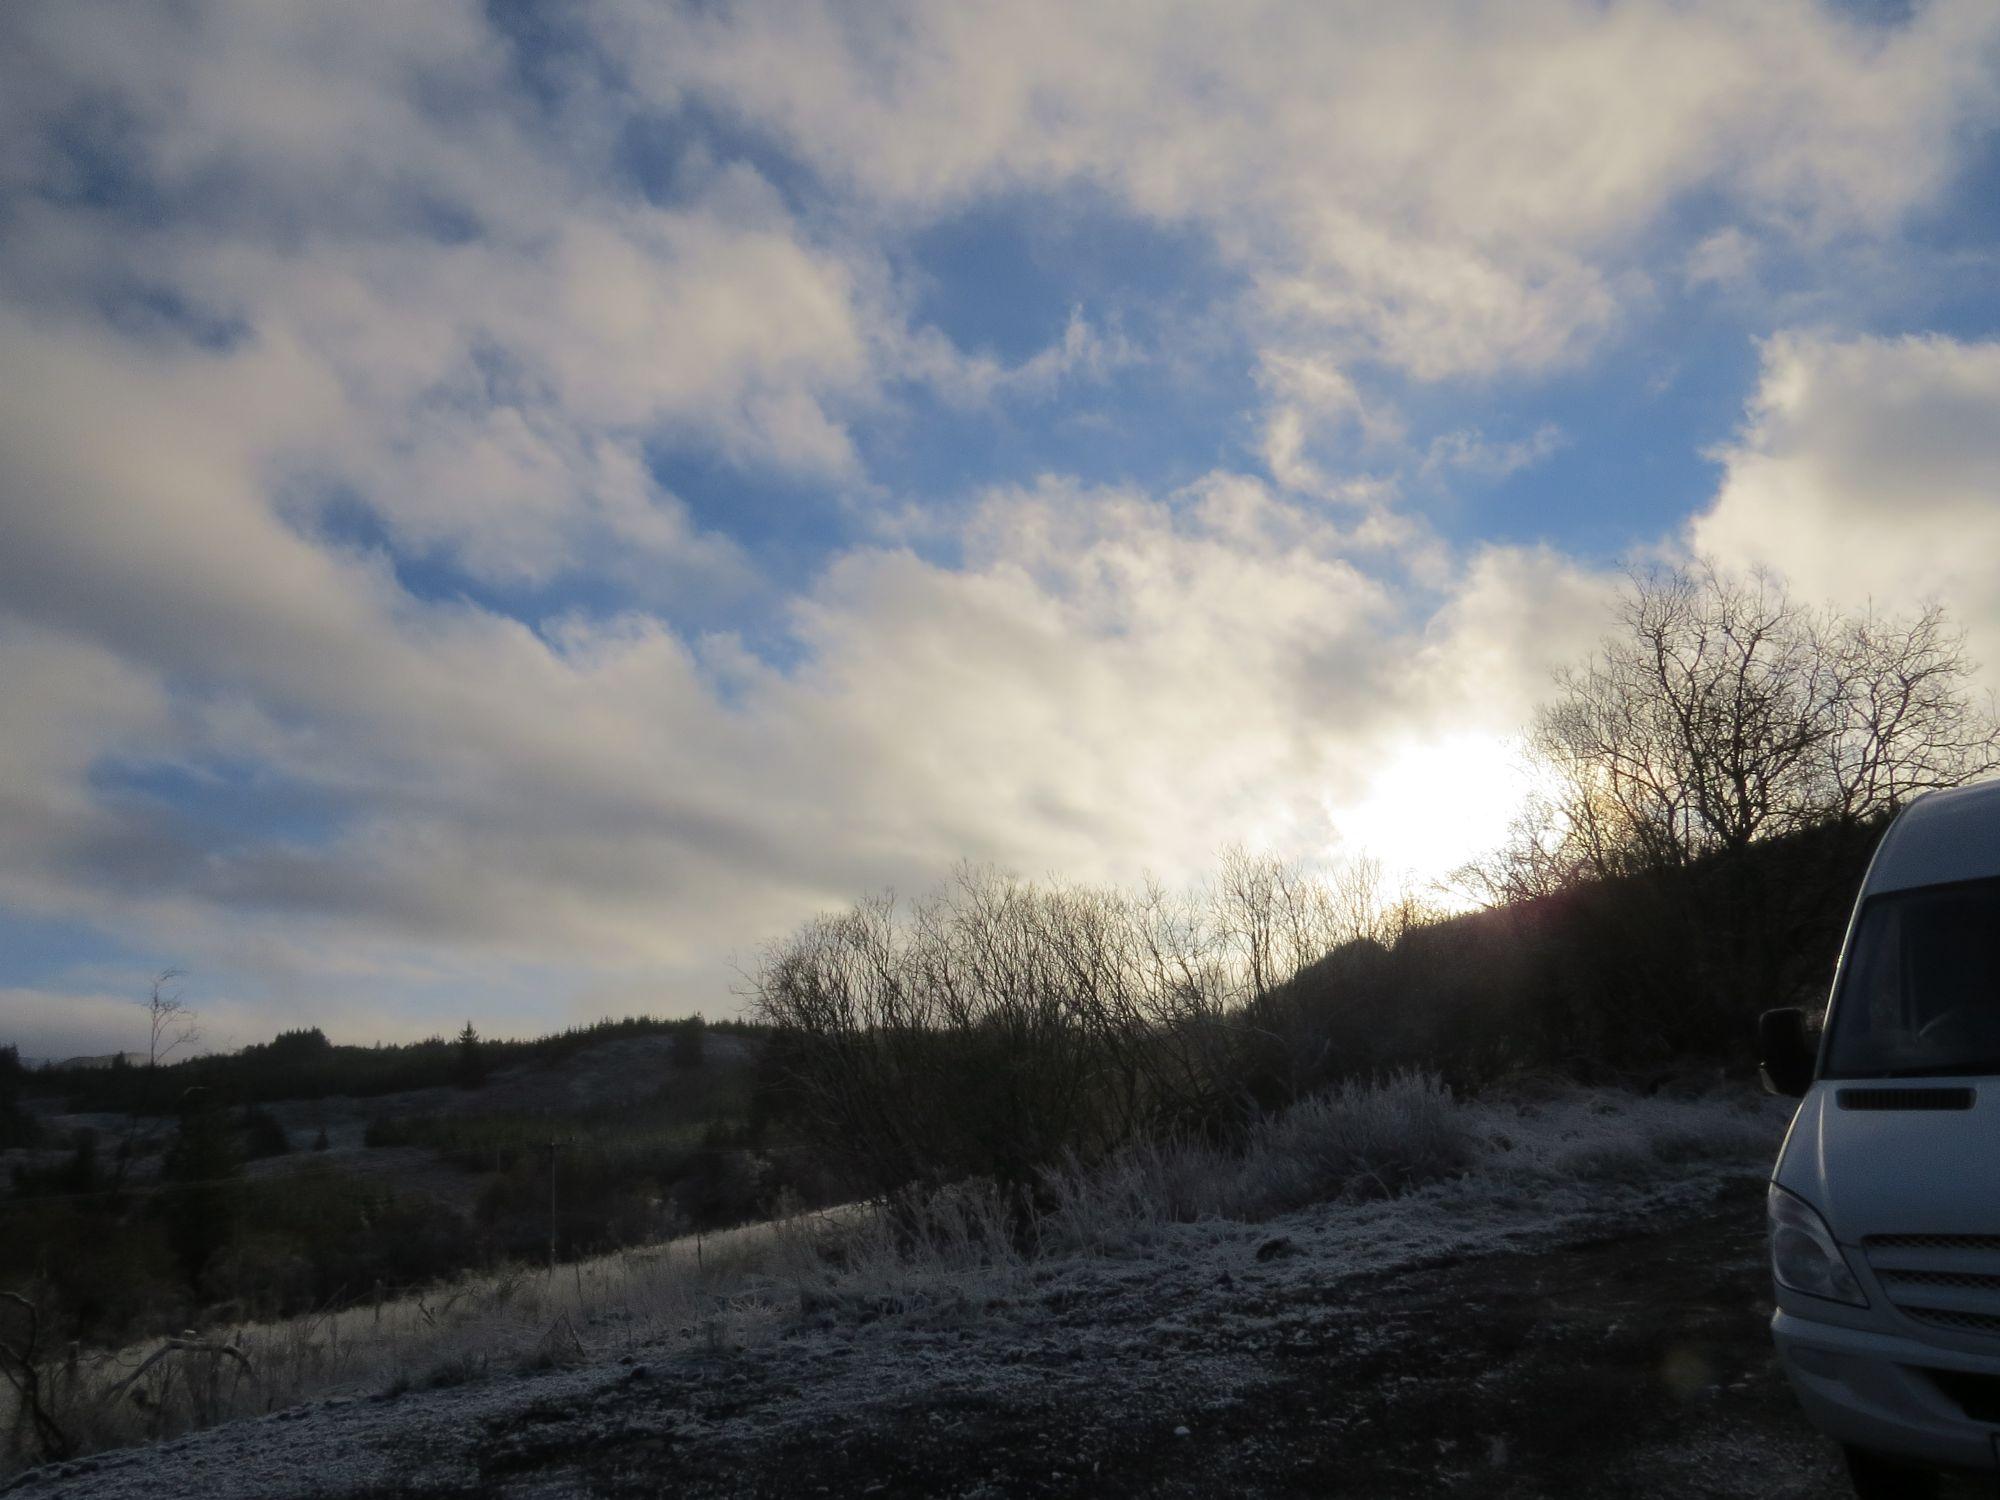 A bit before Loch Awe